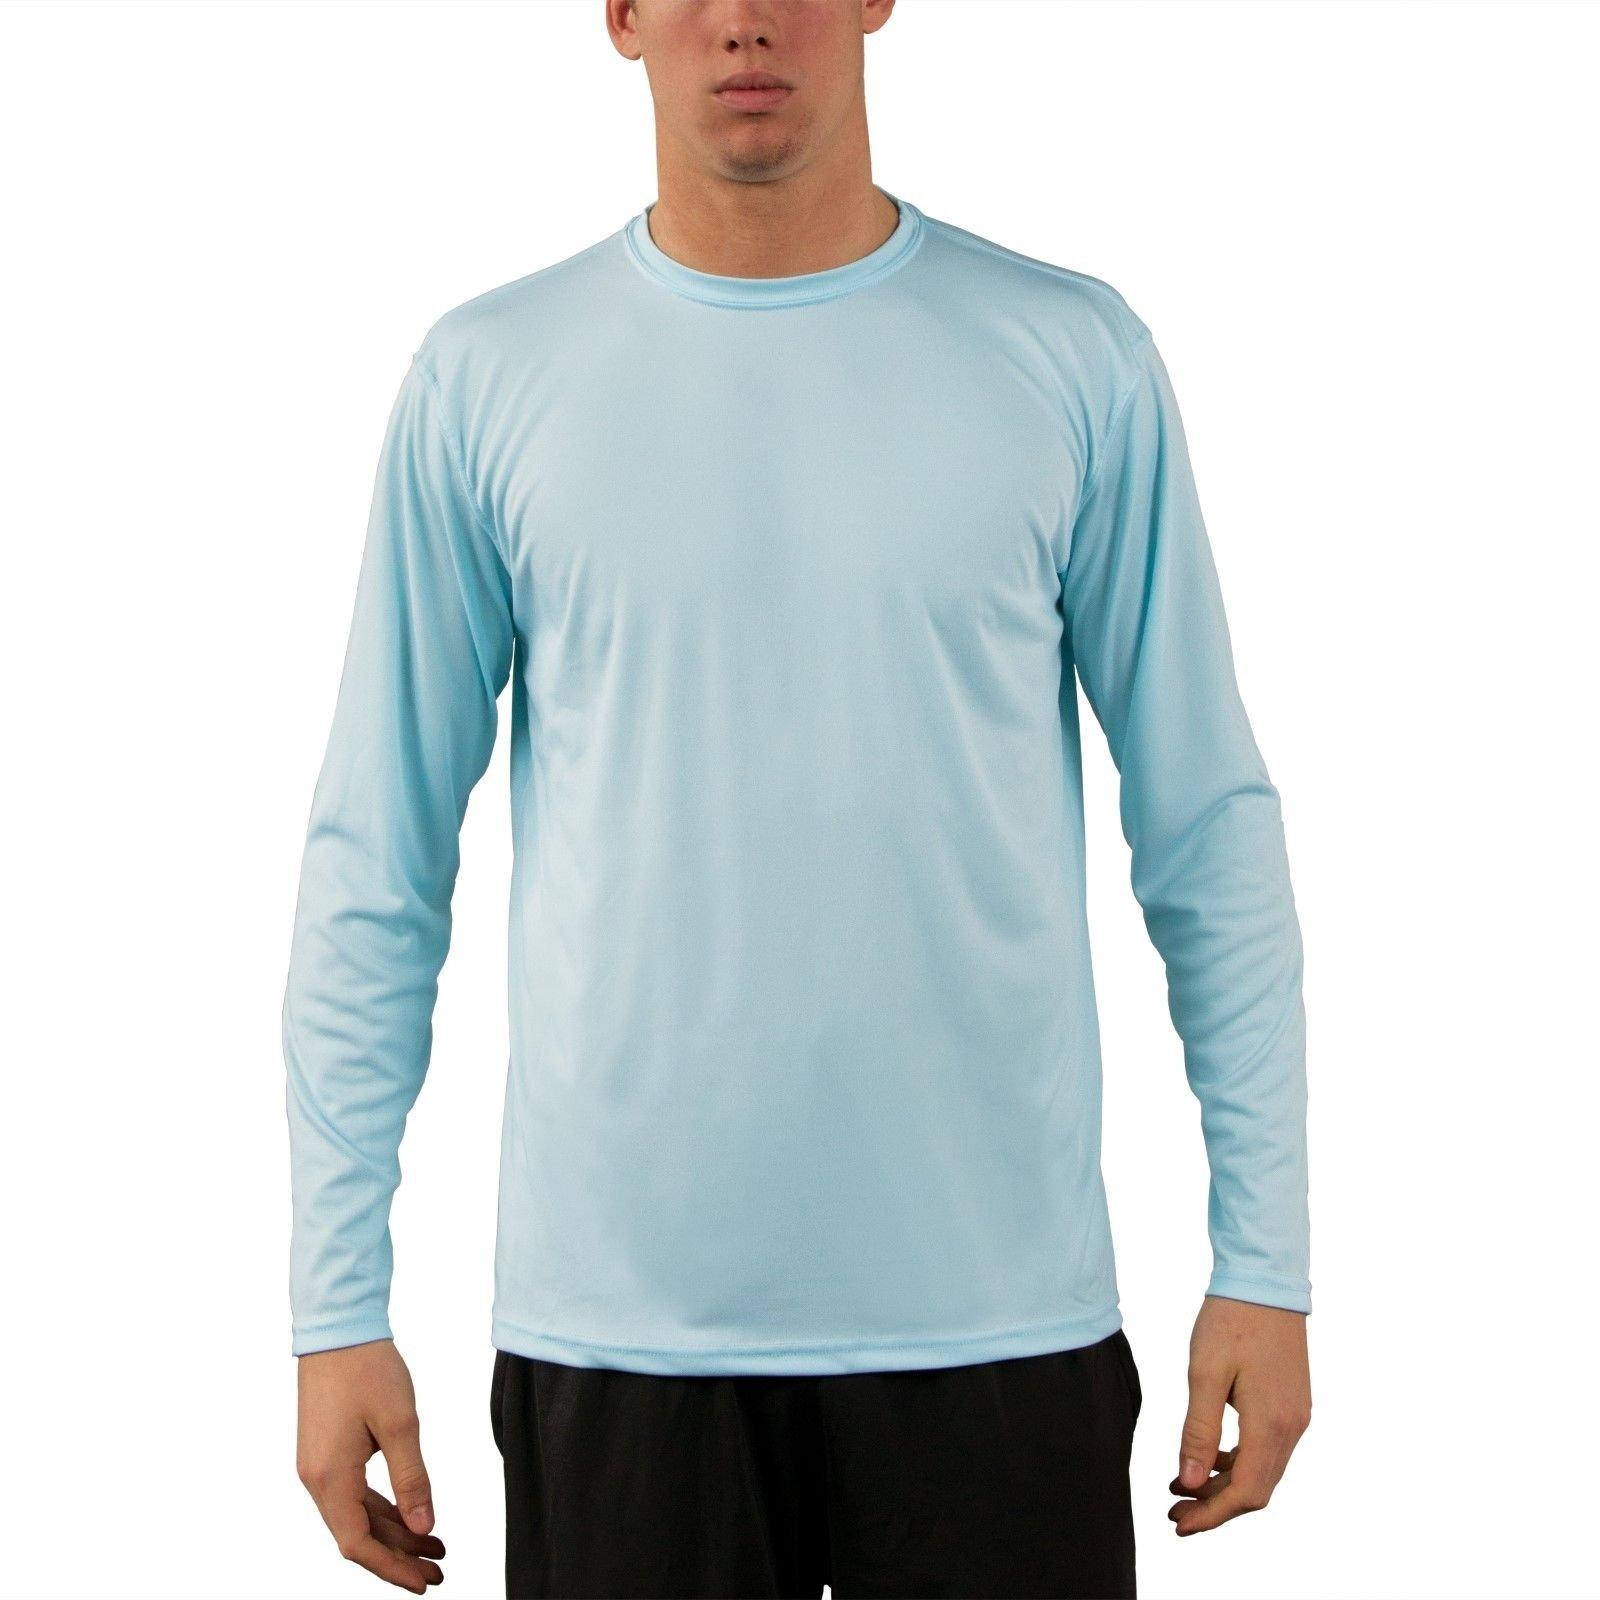 Vapor apparel men 39 s upf 50 uv sun protection long sleeve for Long sleeve sun shirt mens